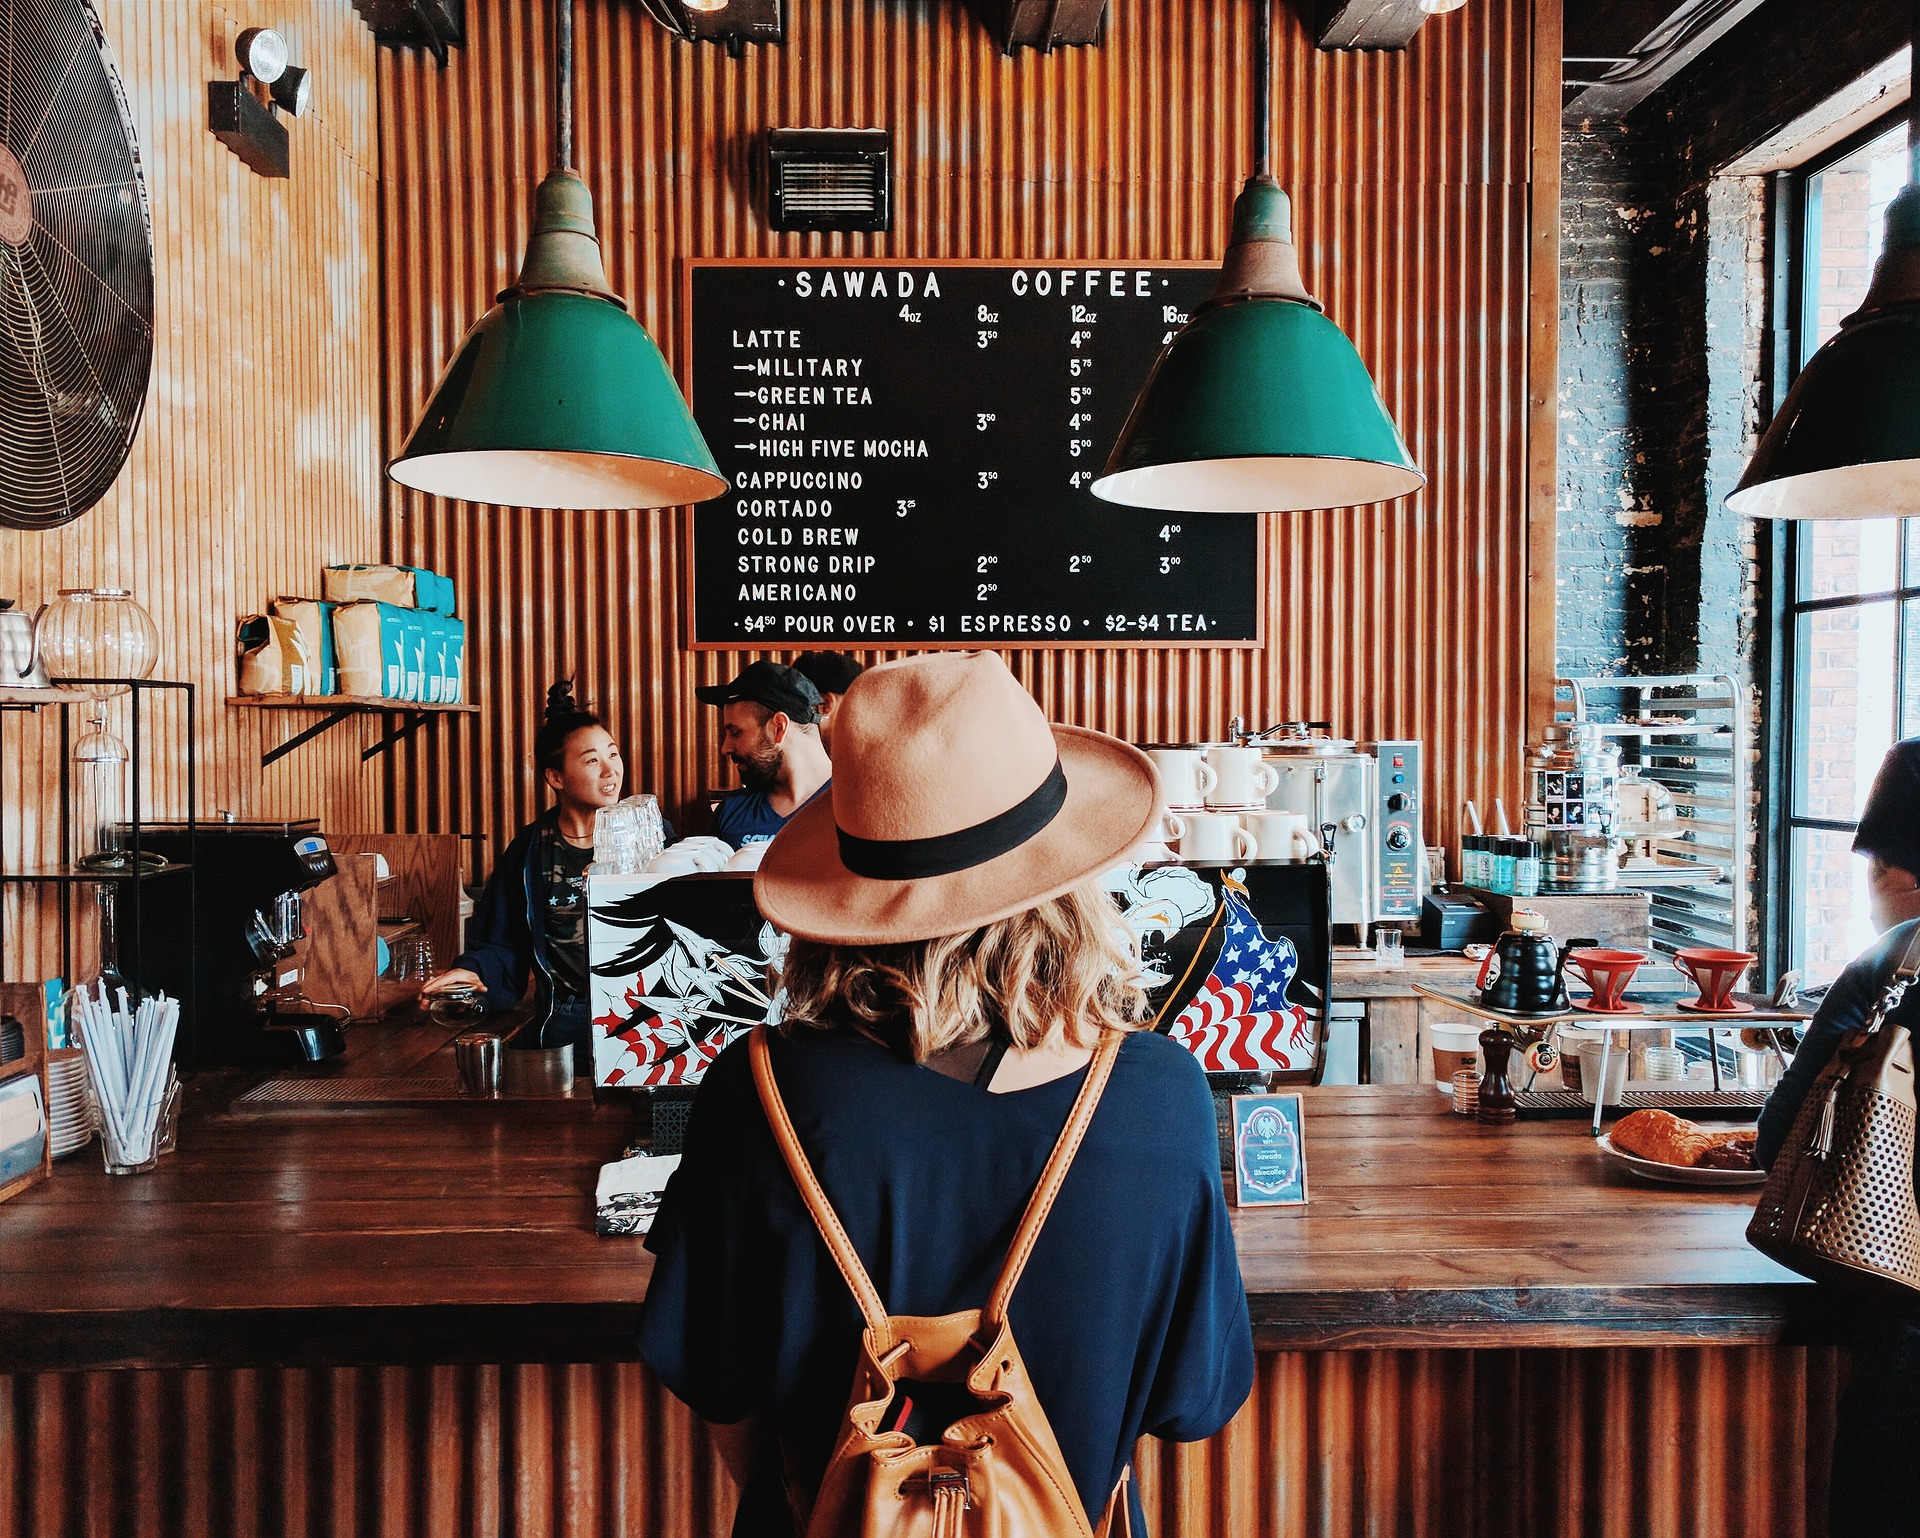 coffee shop adult-1846748_1920 pixabay pexels